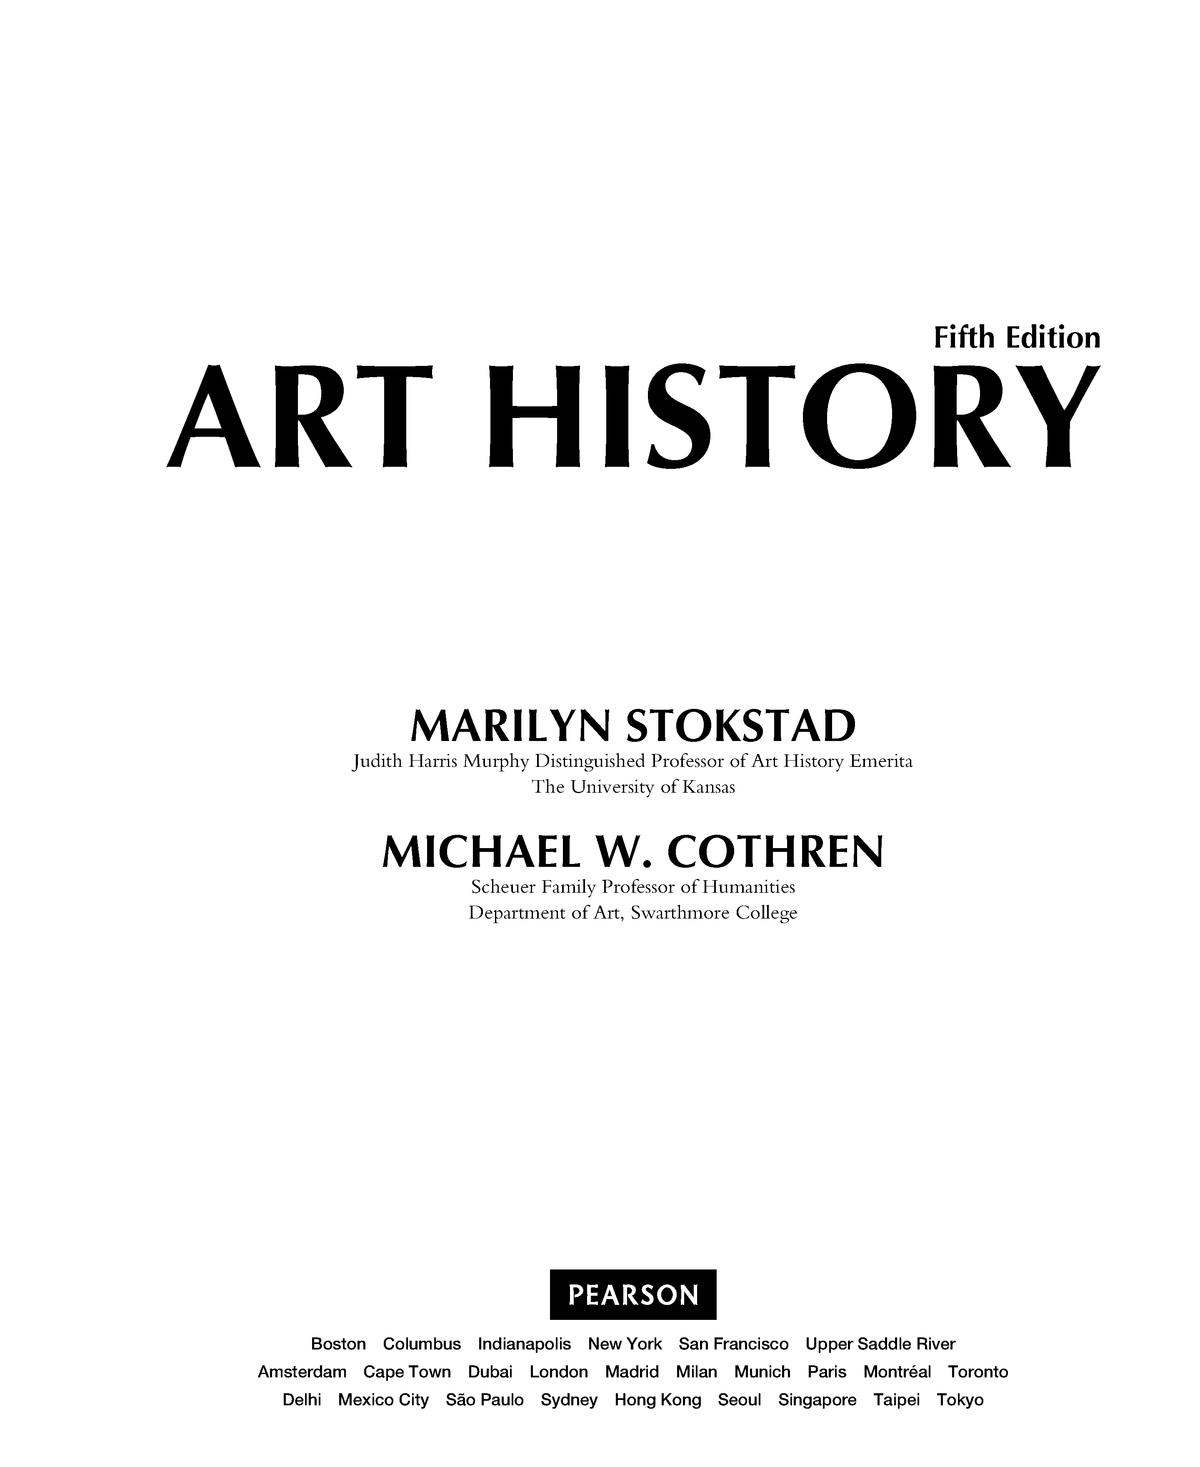 stokstad and cothren art history 5th edition